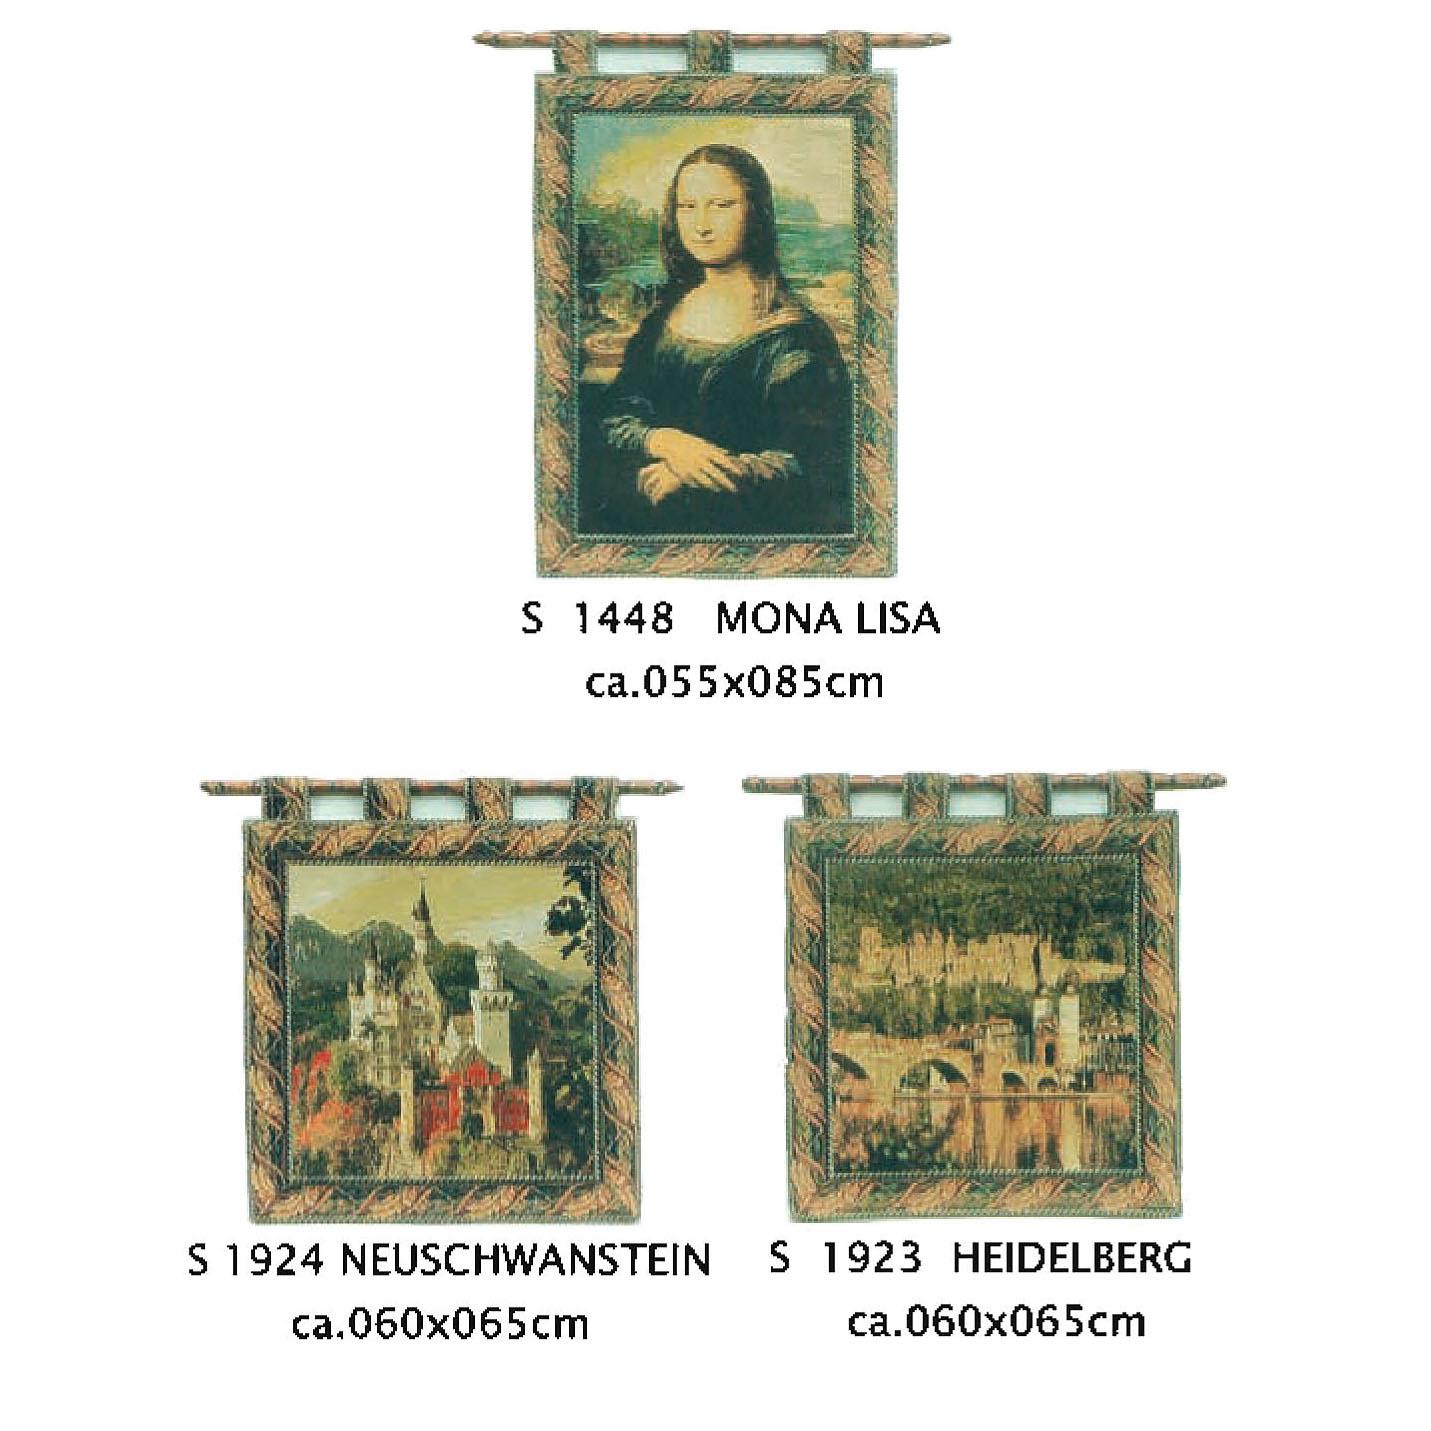 Luka, S1448 Mona Lisa <br> Гобелен Мона Лиза <br>размер 055х085, S1924 Neuscwanstein размер 060х065, S1923 Heidelberg размер 060х065